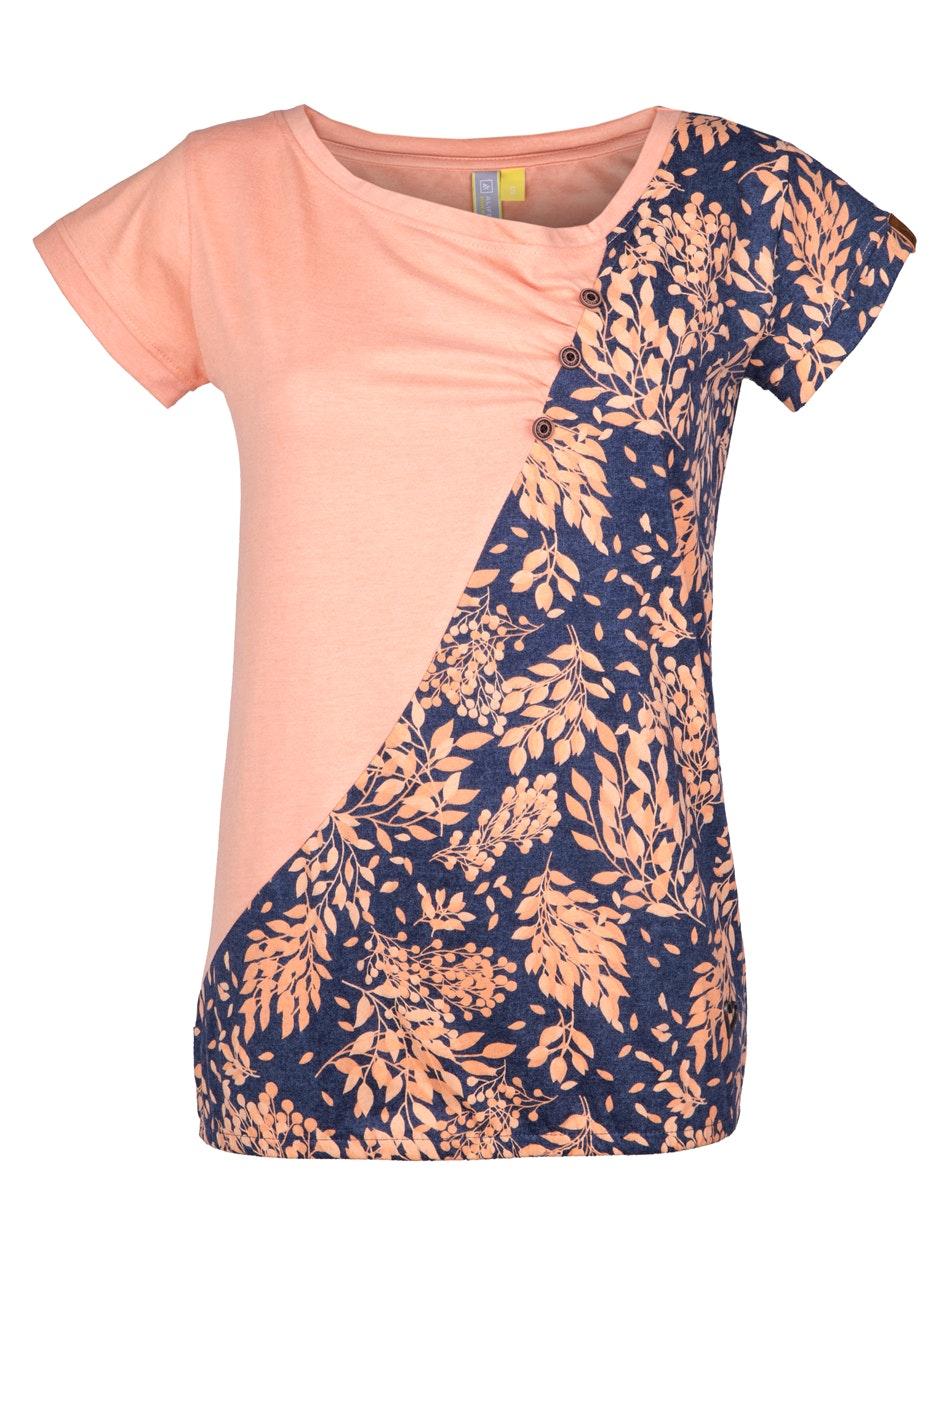 alife and kickin Shirt Zoe peach